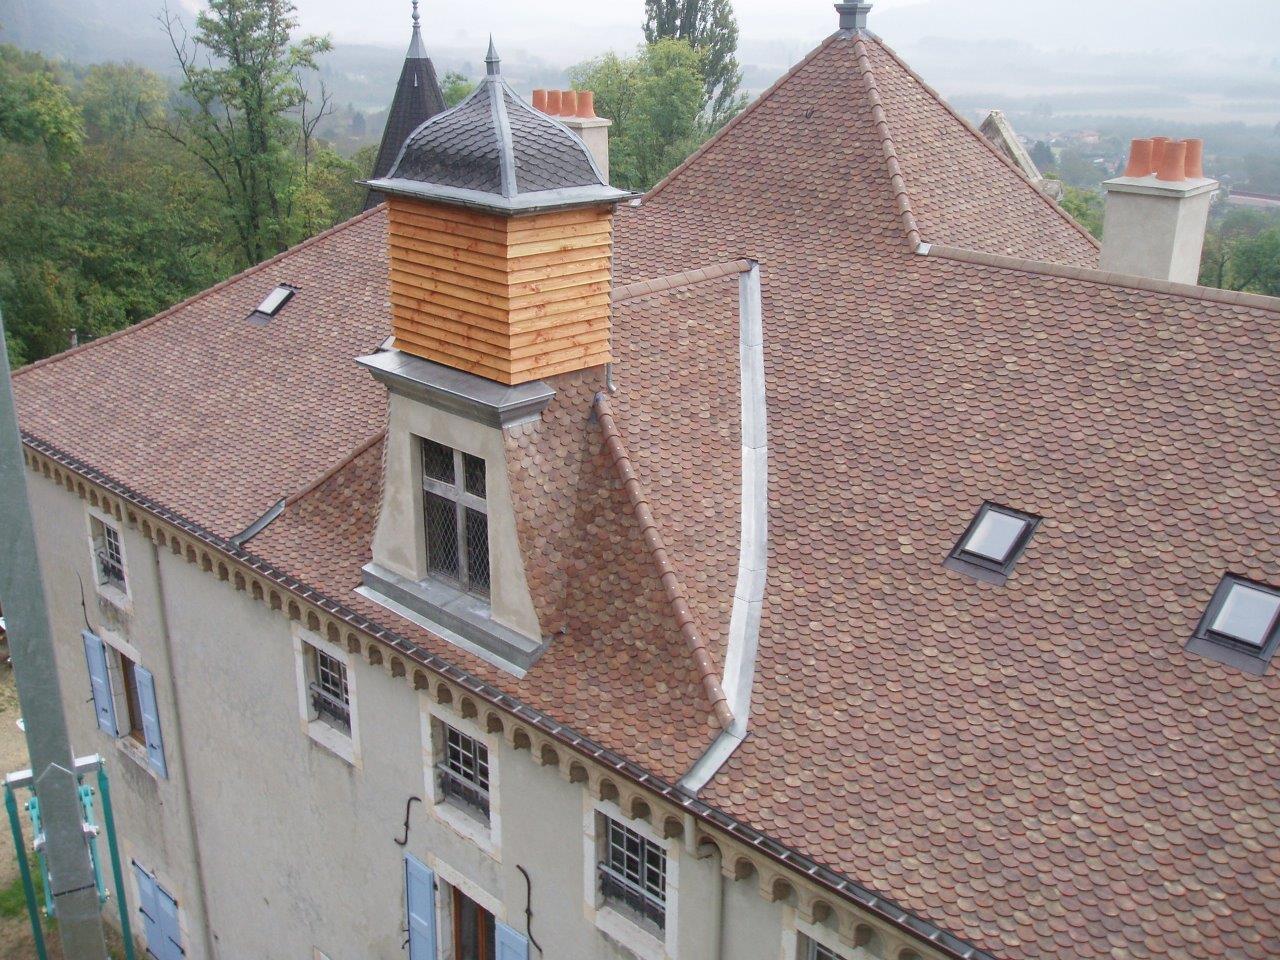 couverture grenoble charpente bois isere toiture ruel. Black Bedroom Furniture Sets. Home Design Ideas